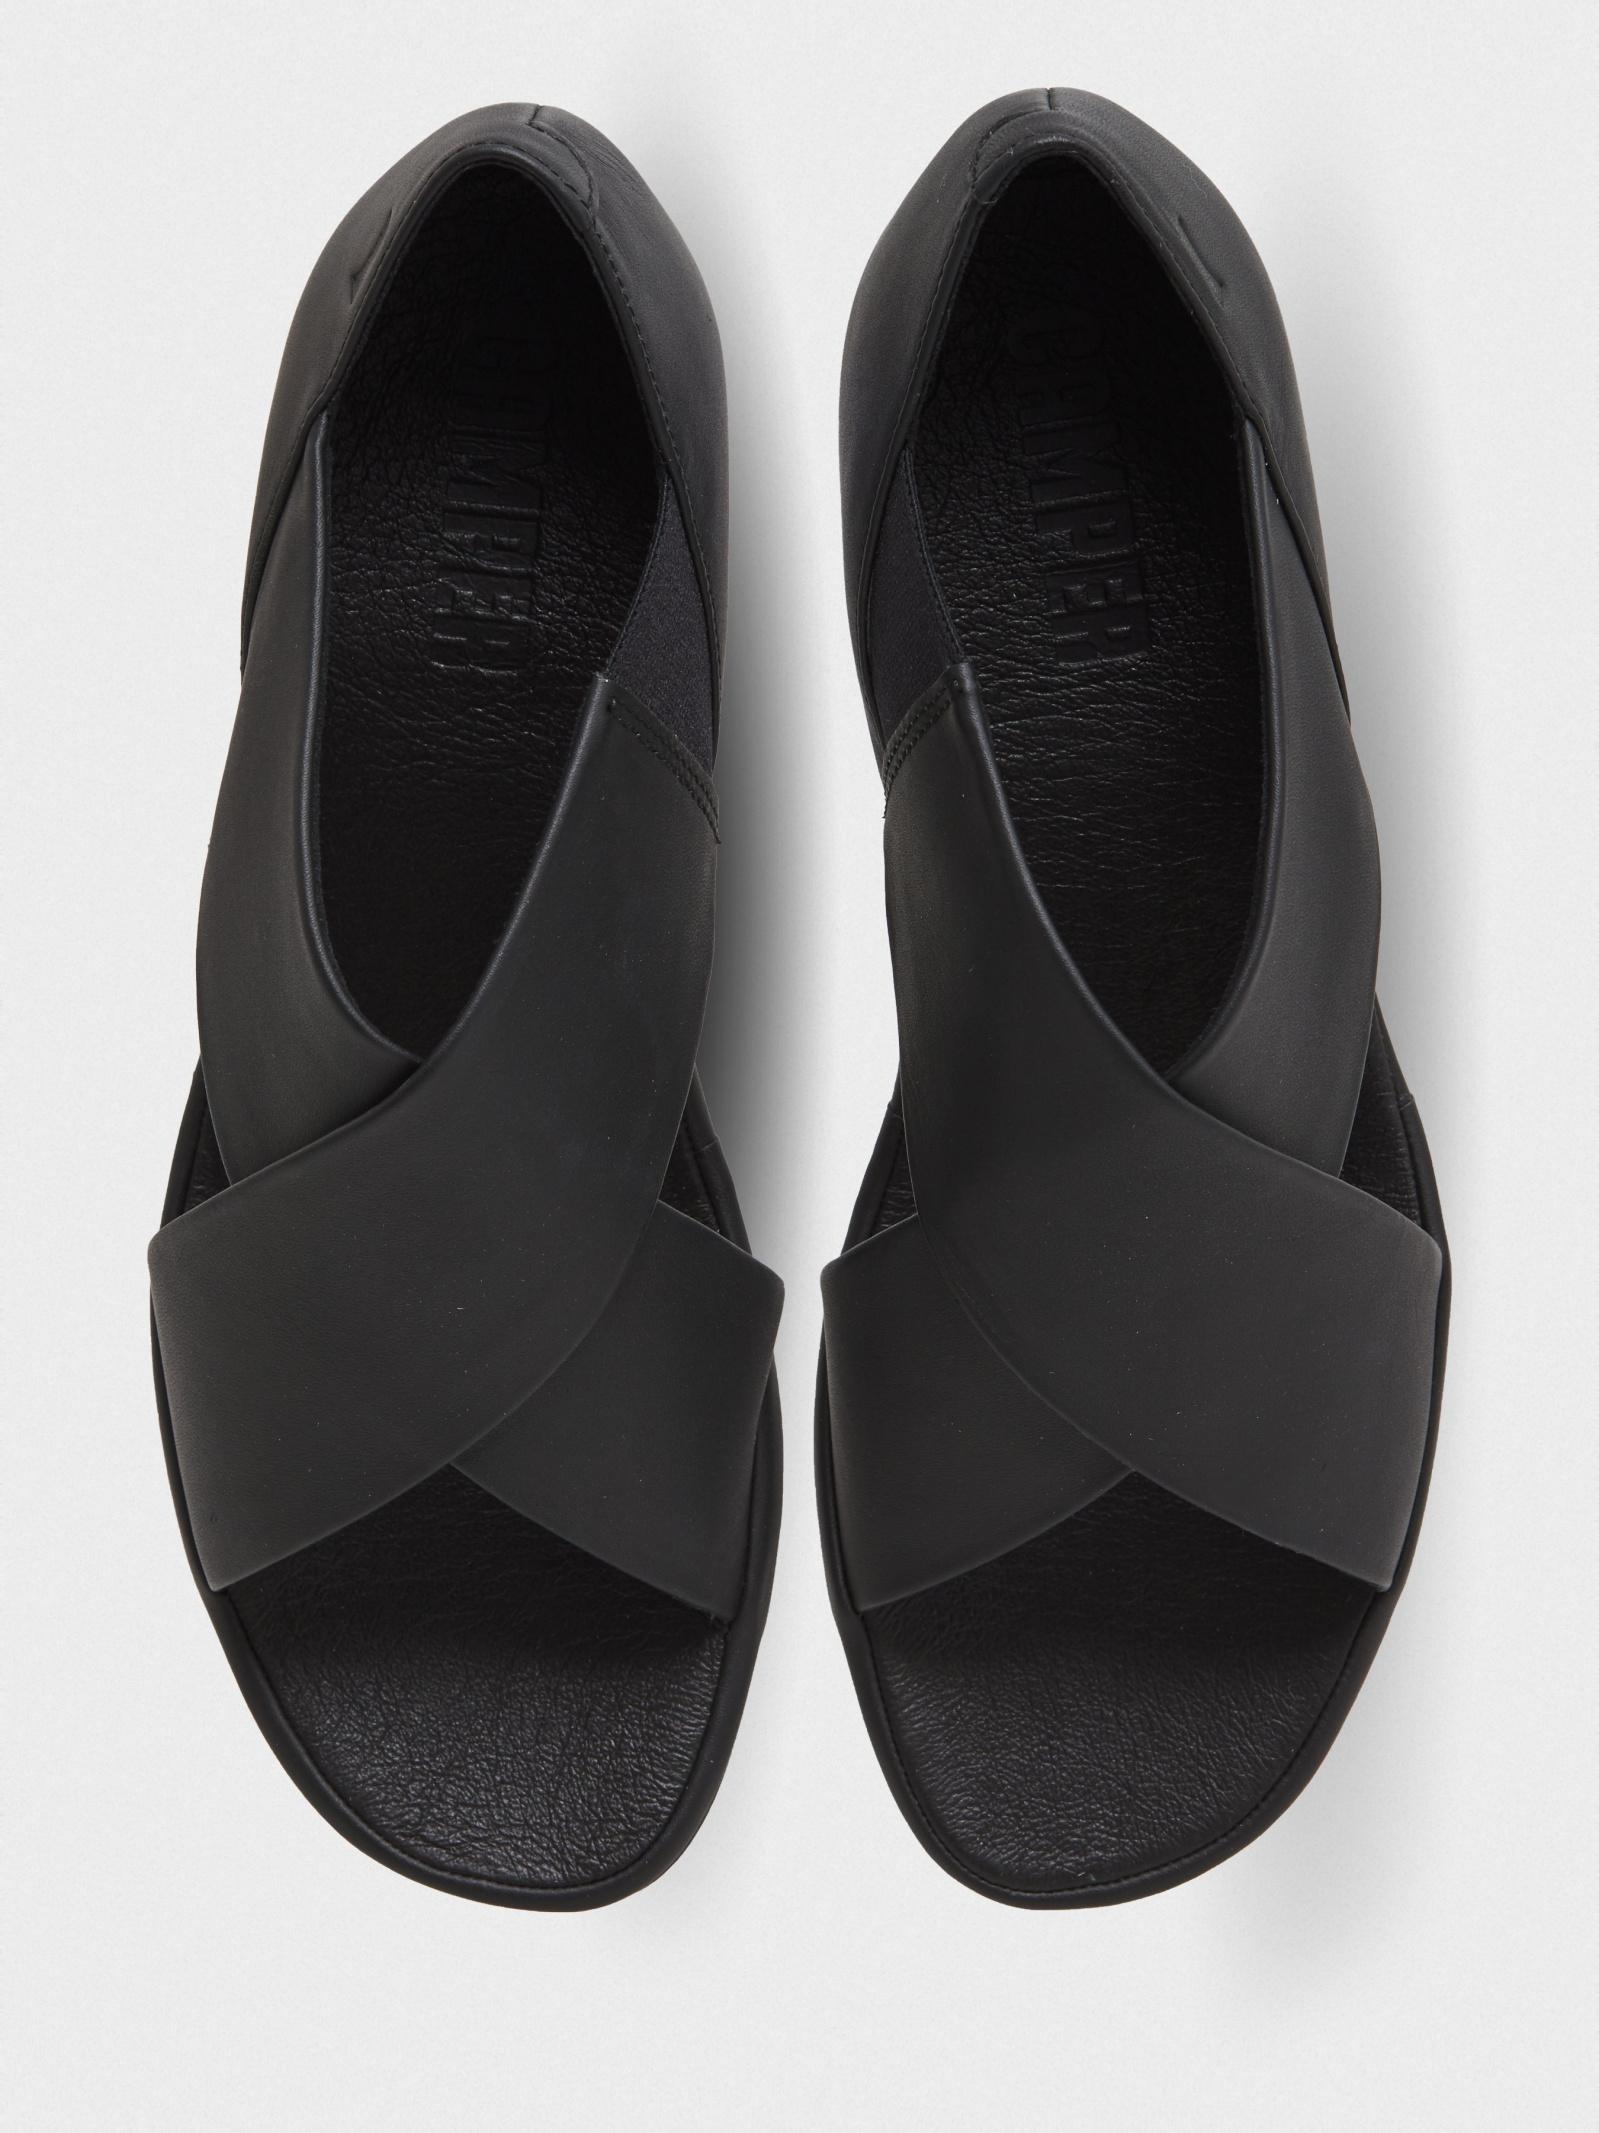 Босоножки для женщин Camper Alright Sandal AW1074 цена обуви, 2017